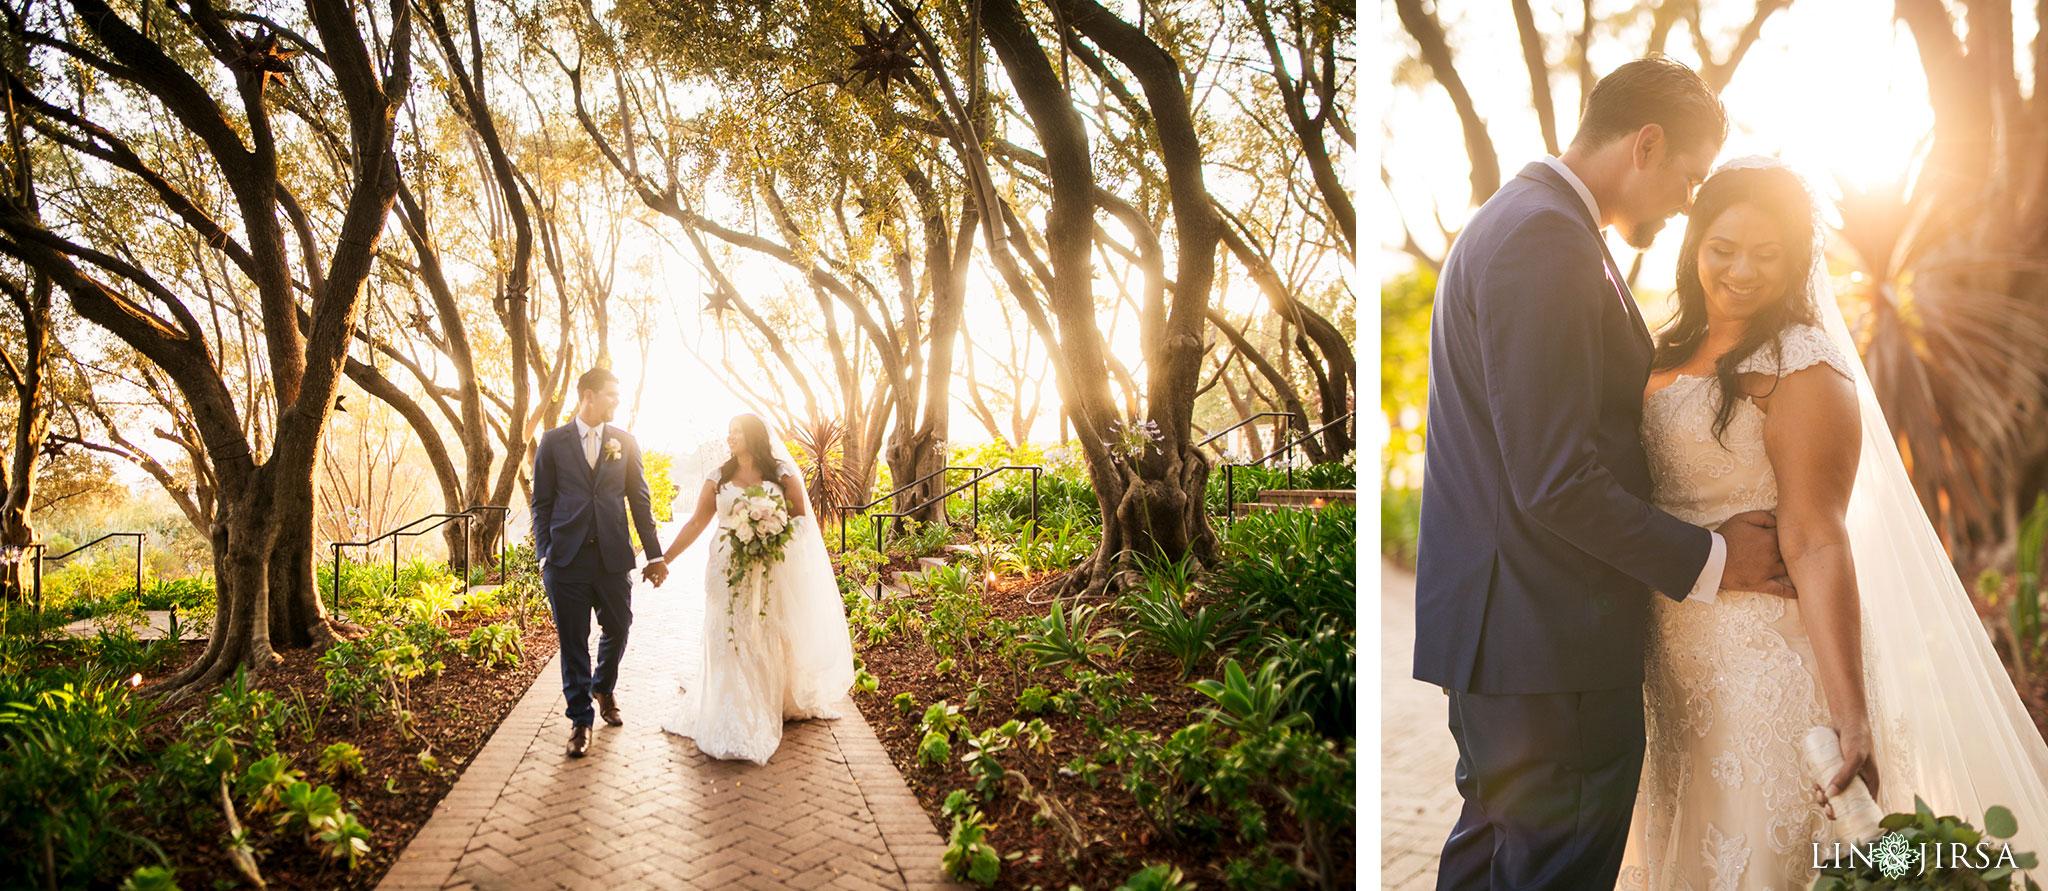 018 padua hills claremont wedding photography